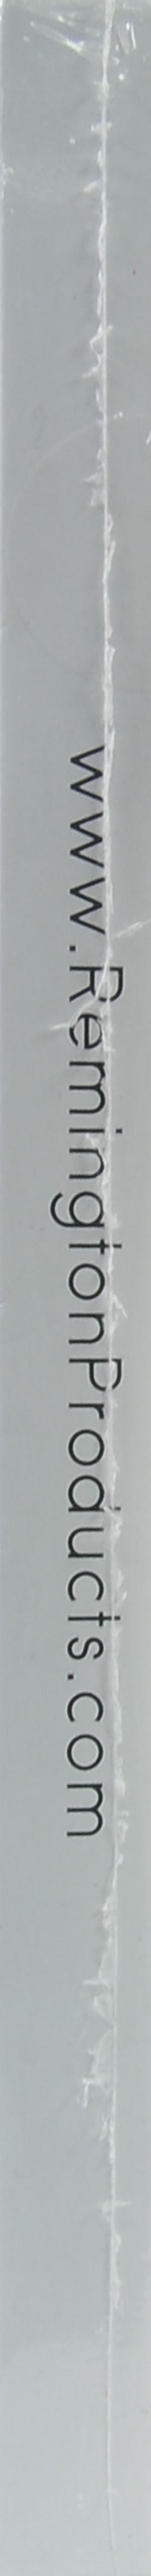 Remington AS1200 Hair Accessory Storage Board